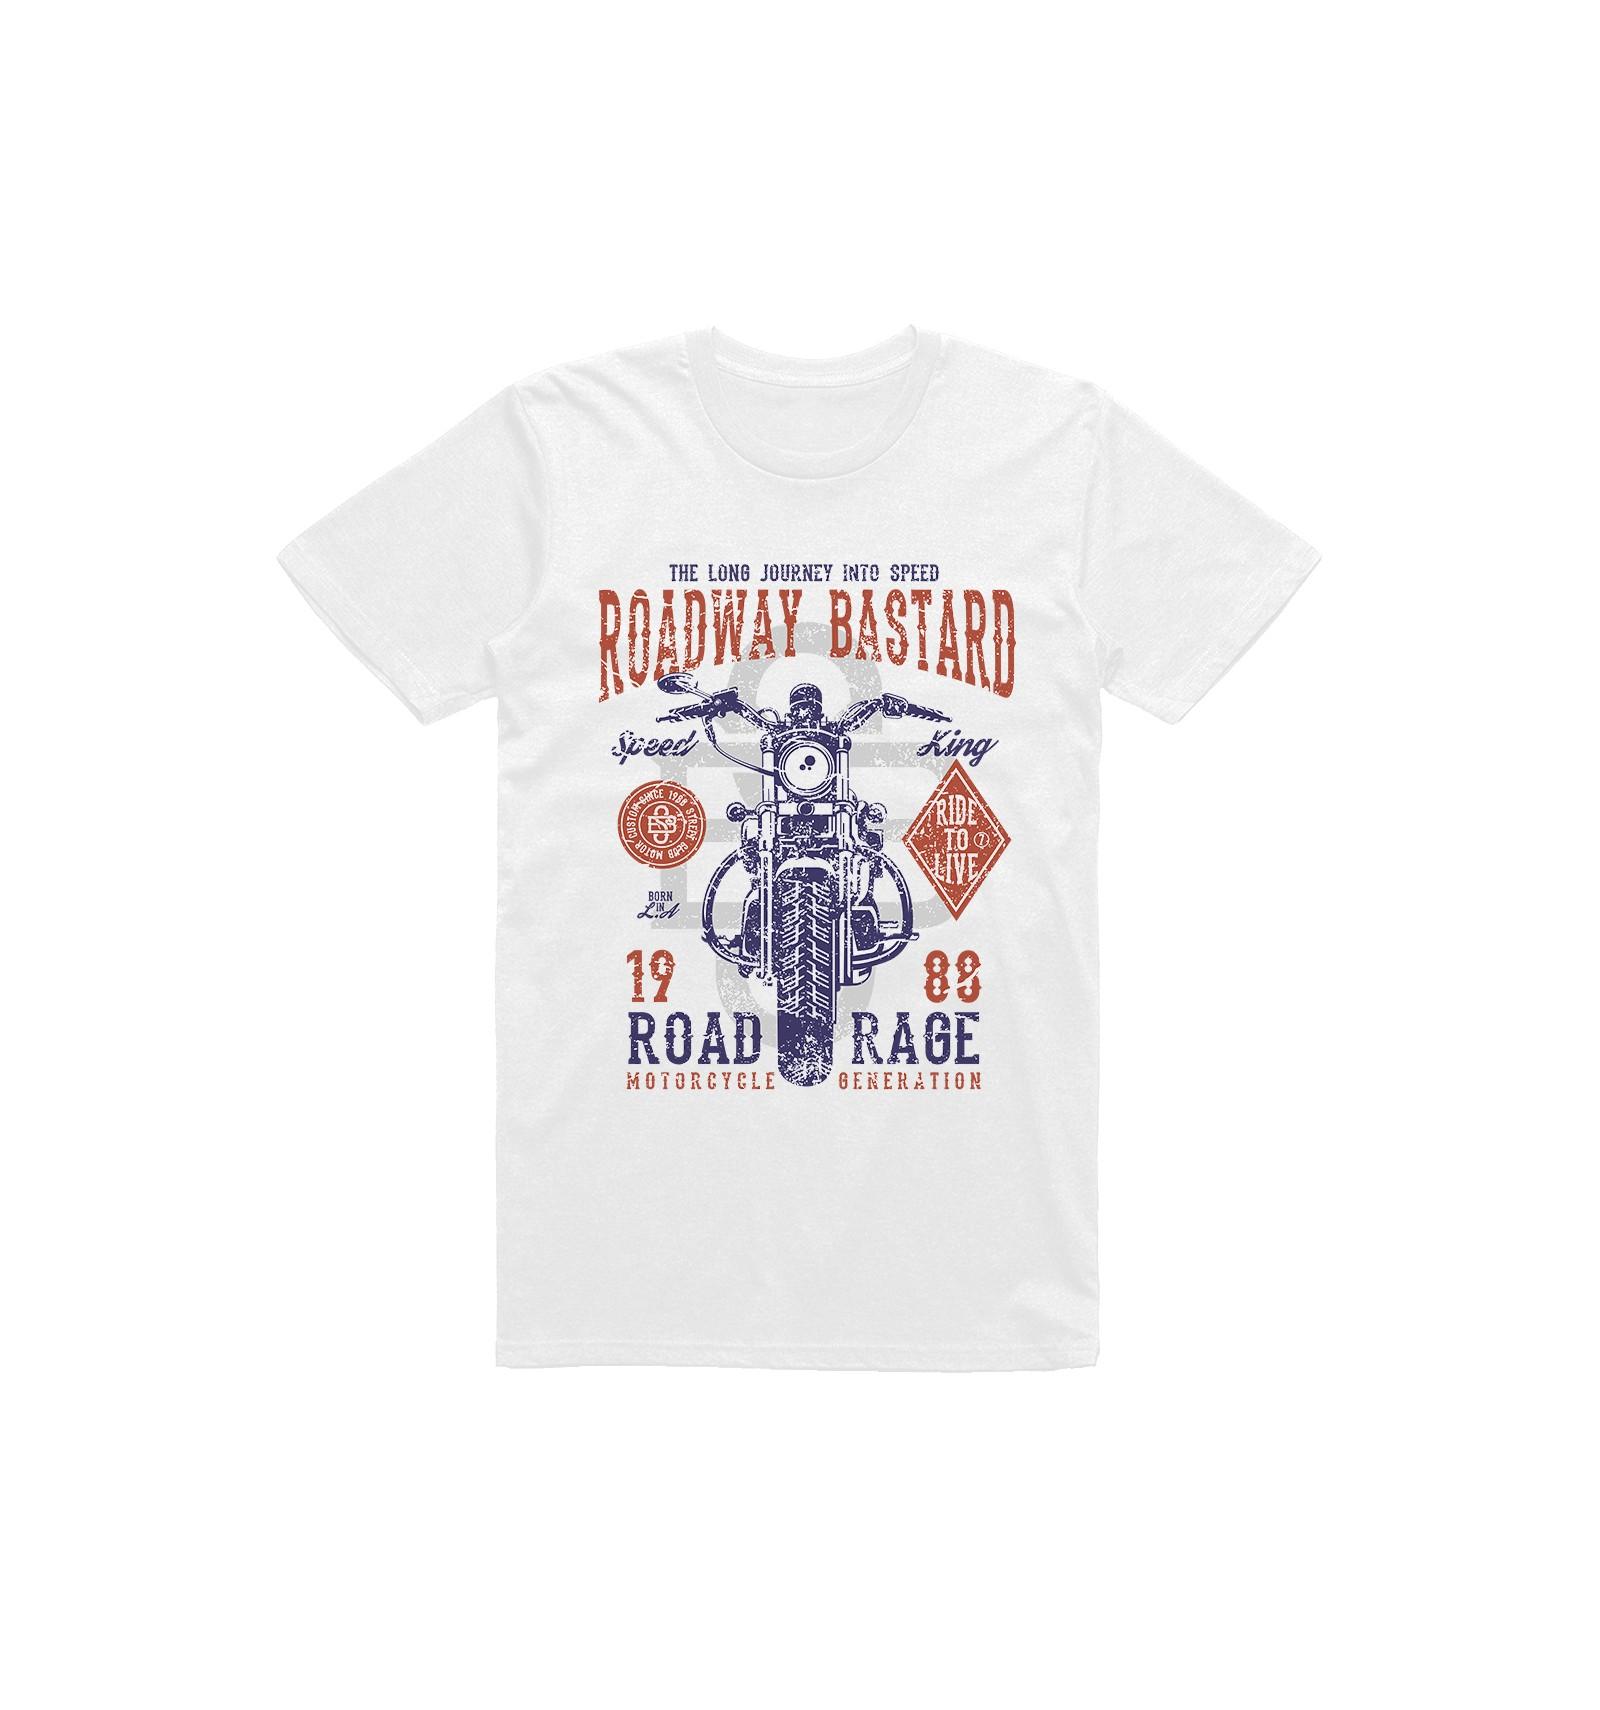 23c88aad96f8 Pánské motorkářské tričko Roadway bastard - Gentlemansgarage.cz